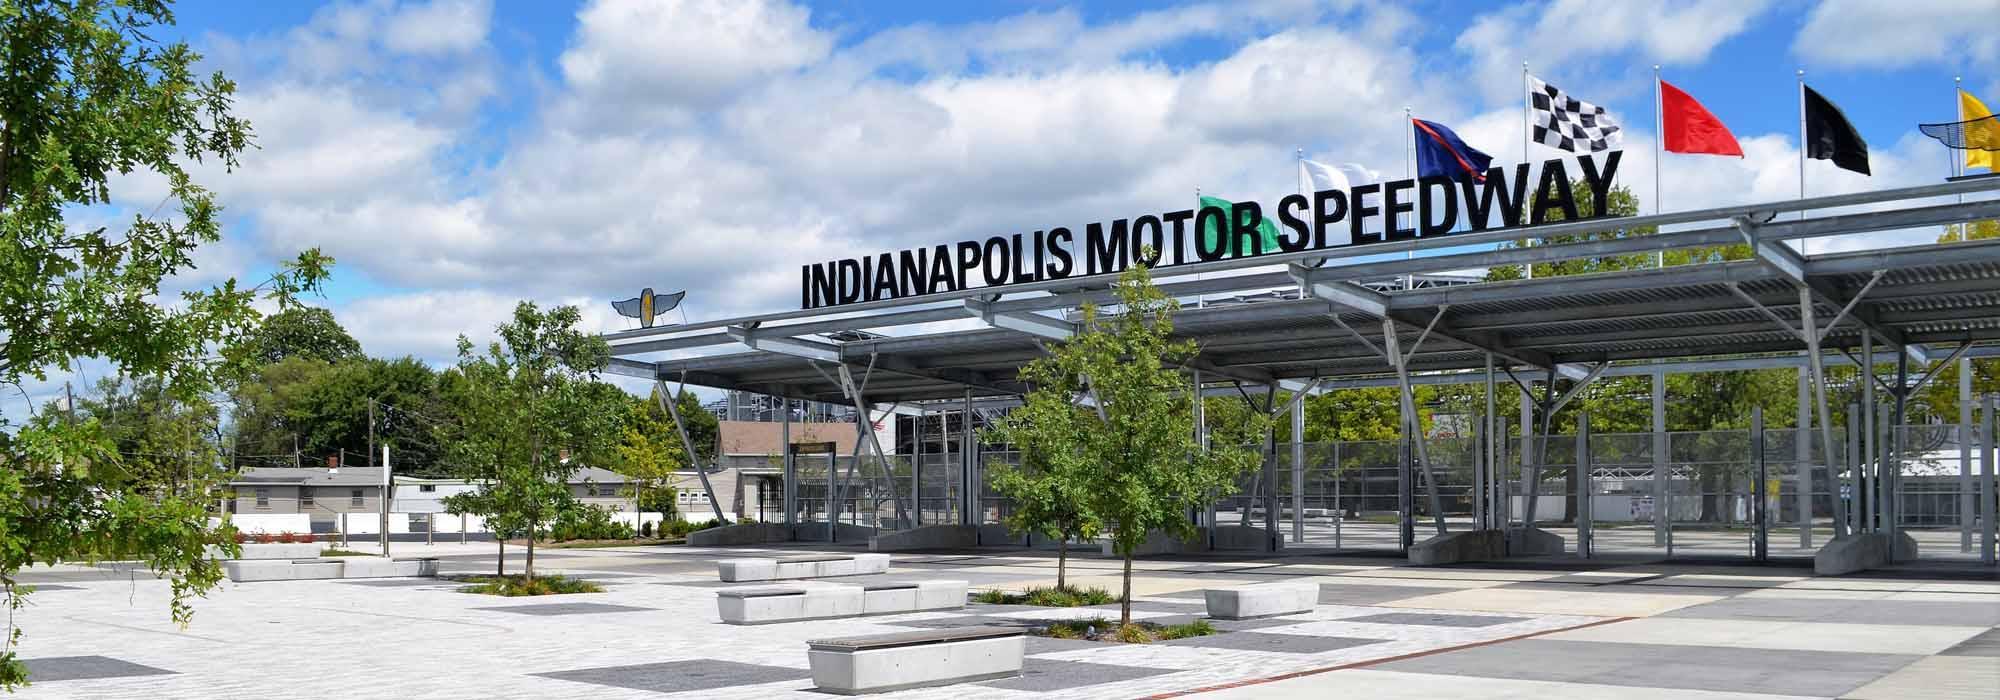 IN_Indianapolis_IndyMotorSpeedway_33_MarcAncel_2017_HERO.jpg